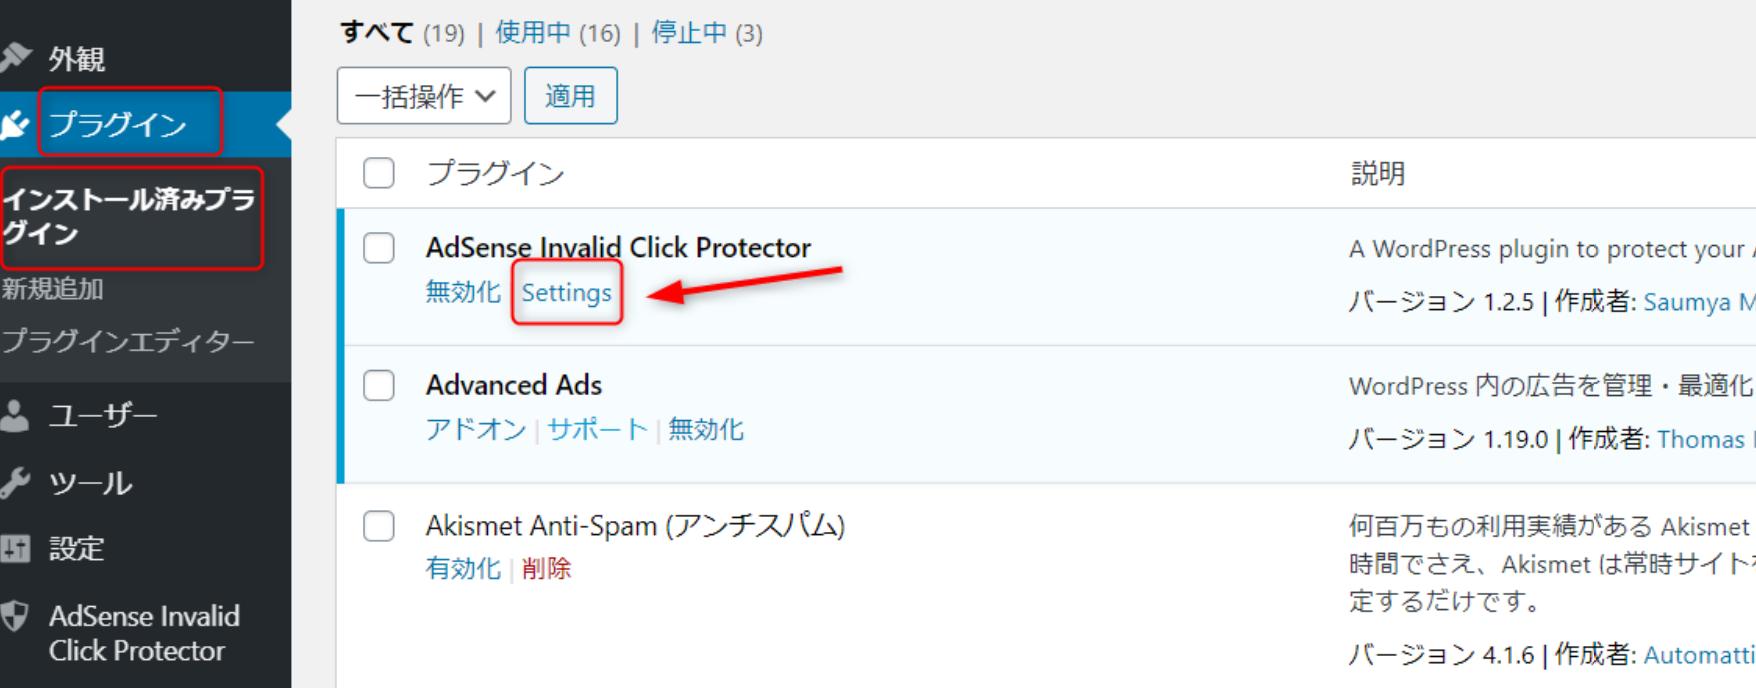 AdSense Invalid Click Protectorの「setting」